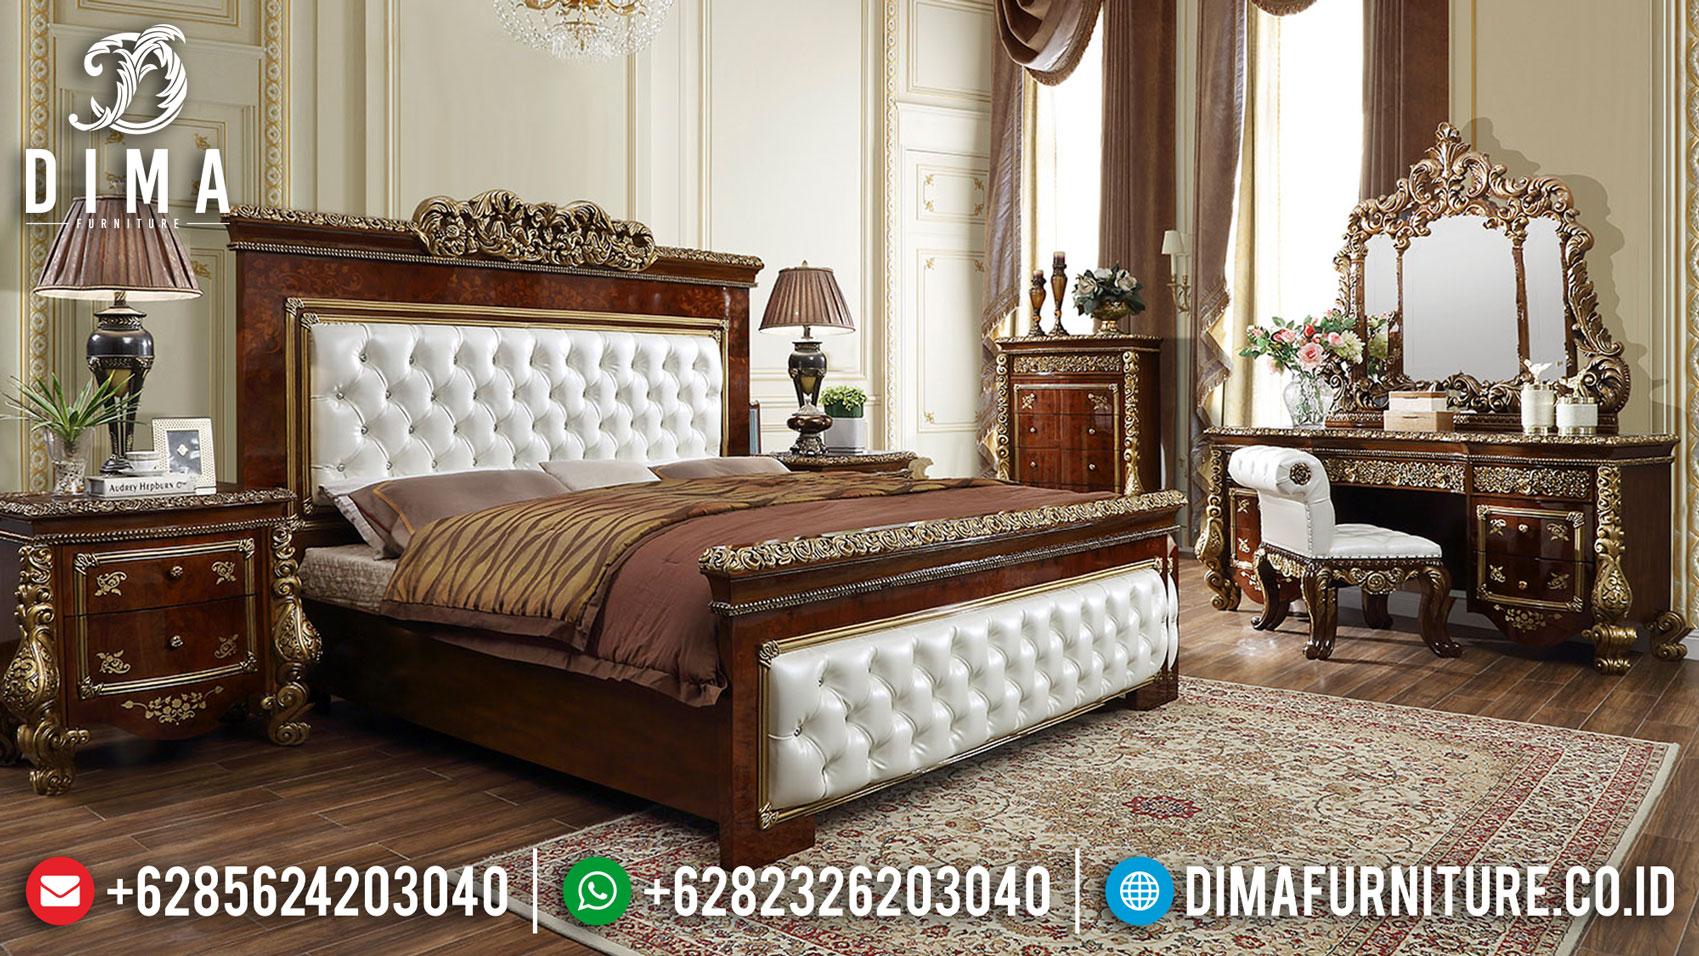 Tempat Tidur Mewah Olethea Natural Luxury Classic Marquetry Wood Motif TTJ-1331